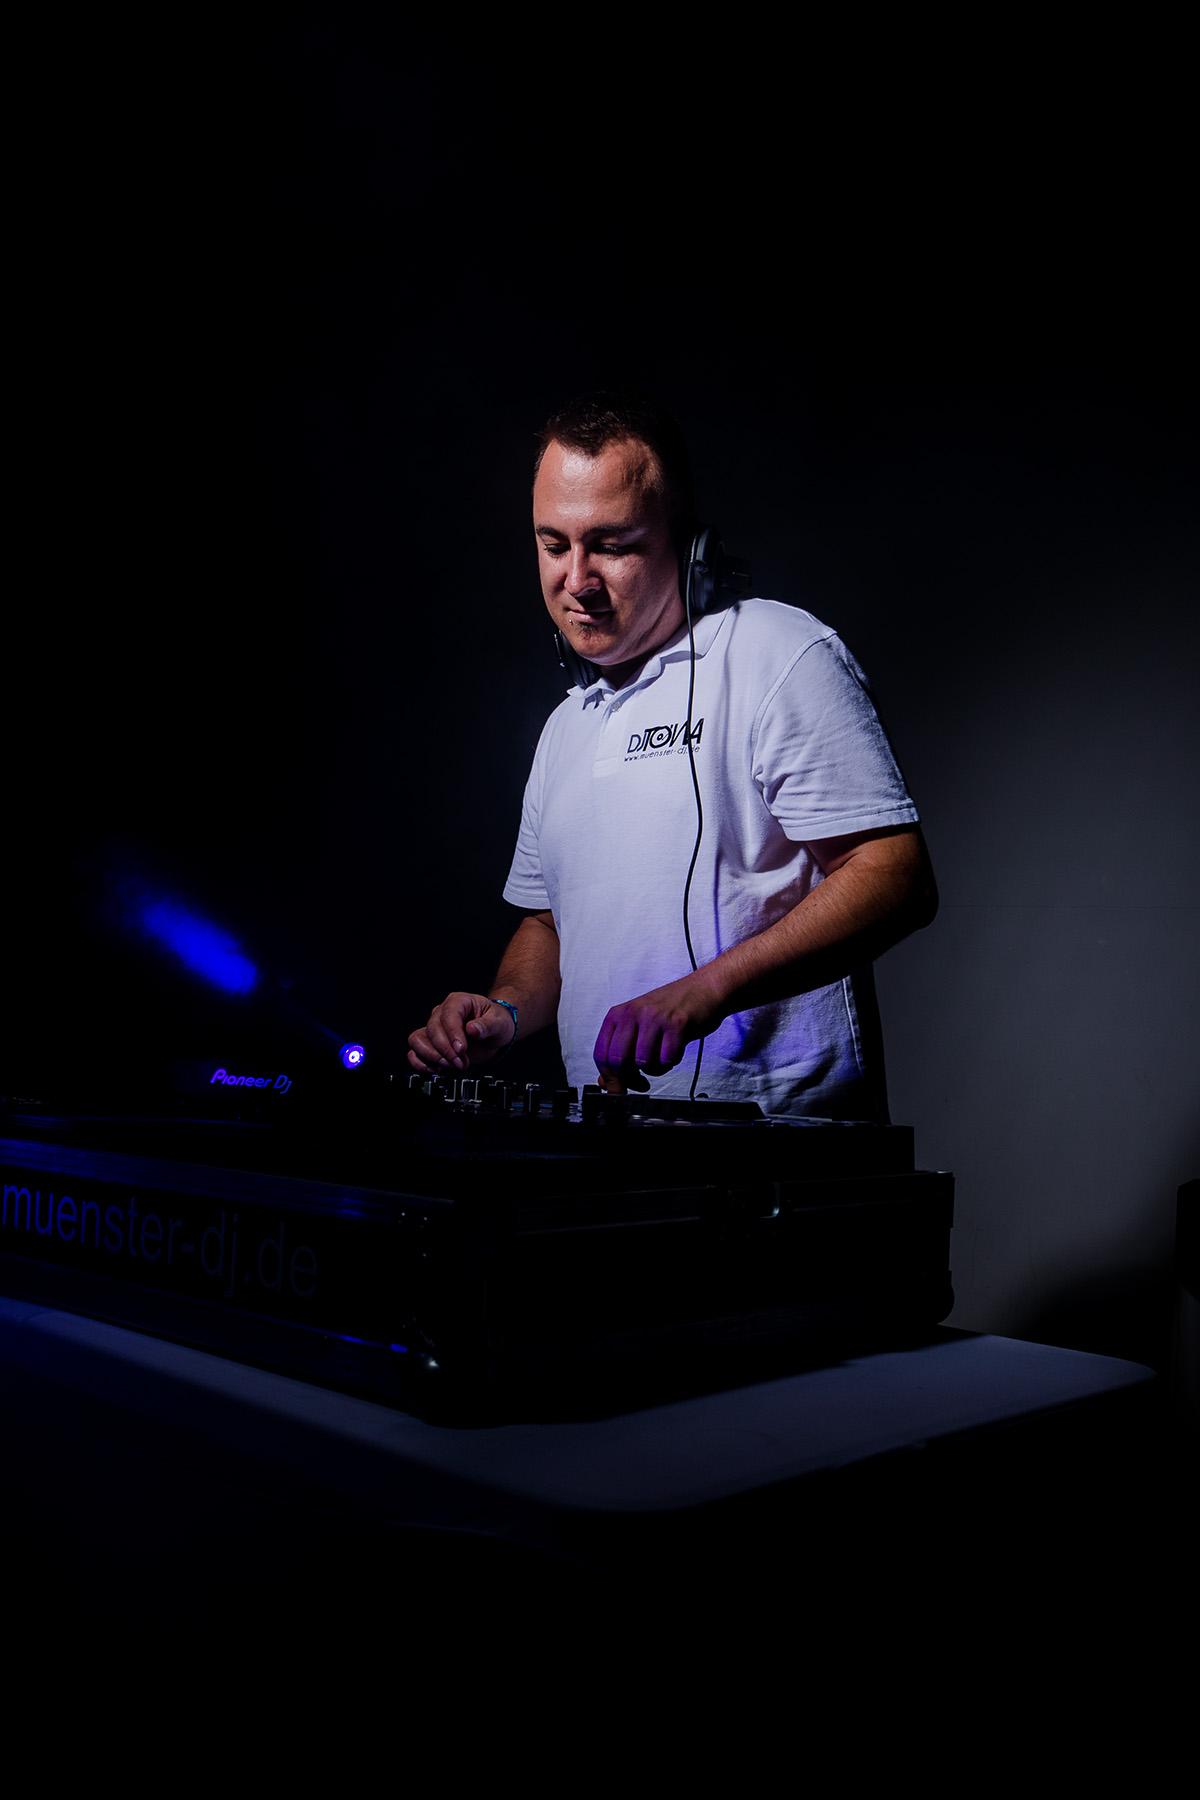 DJ; Imageshoting; Studio; Portrait; Turntable; Disc Jockey